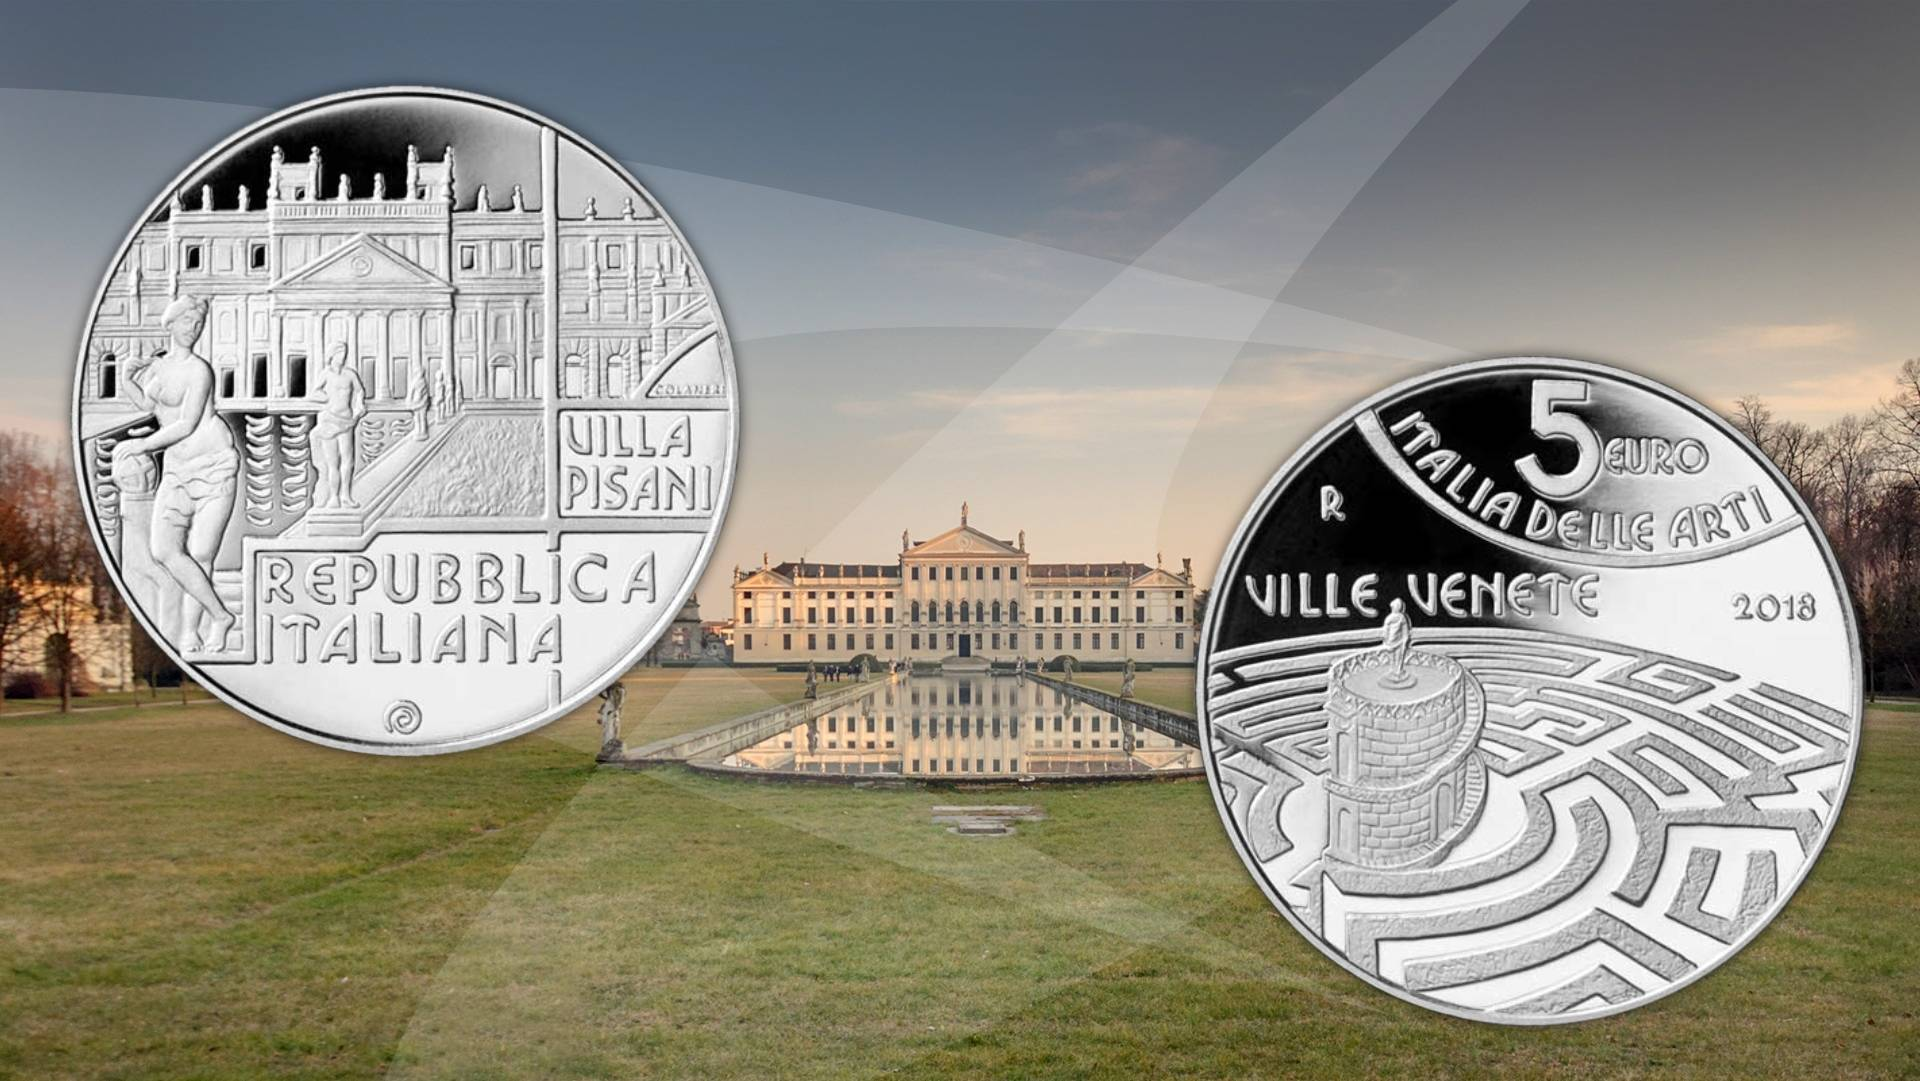 Ecco Villa Pisani - moneta 5 euro